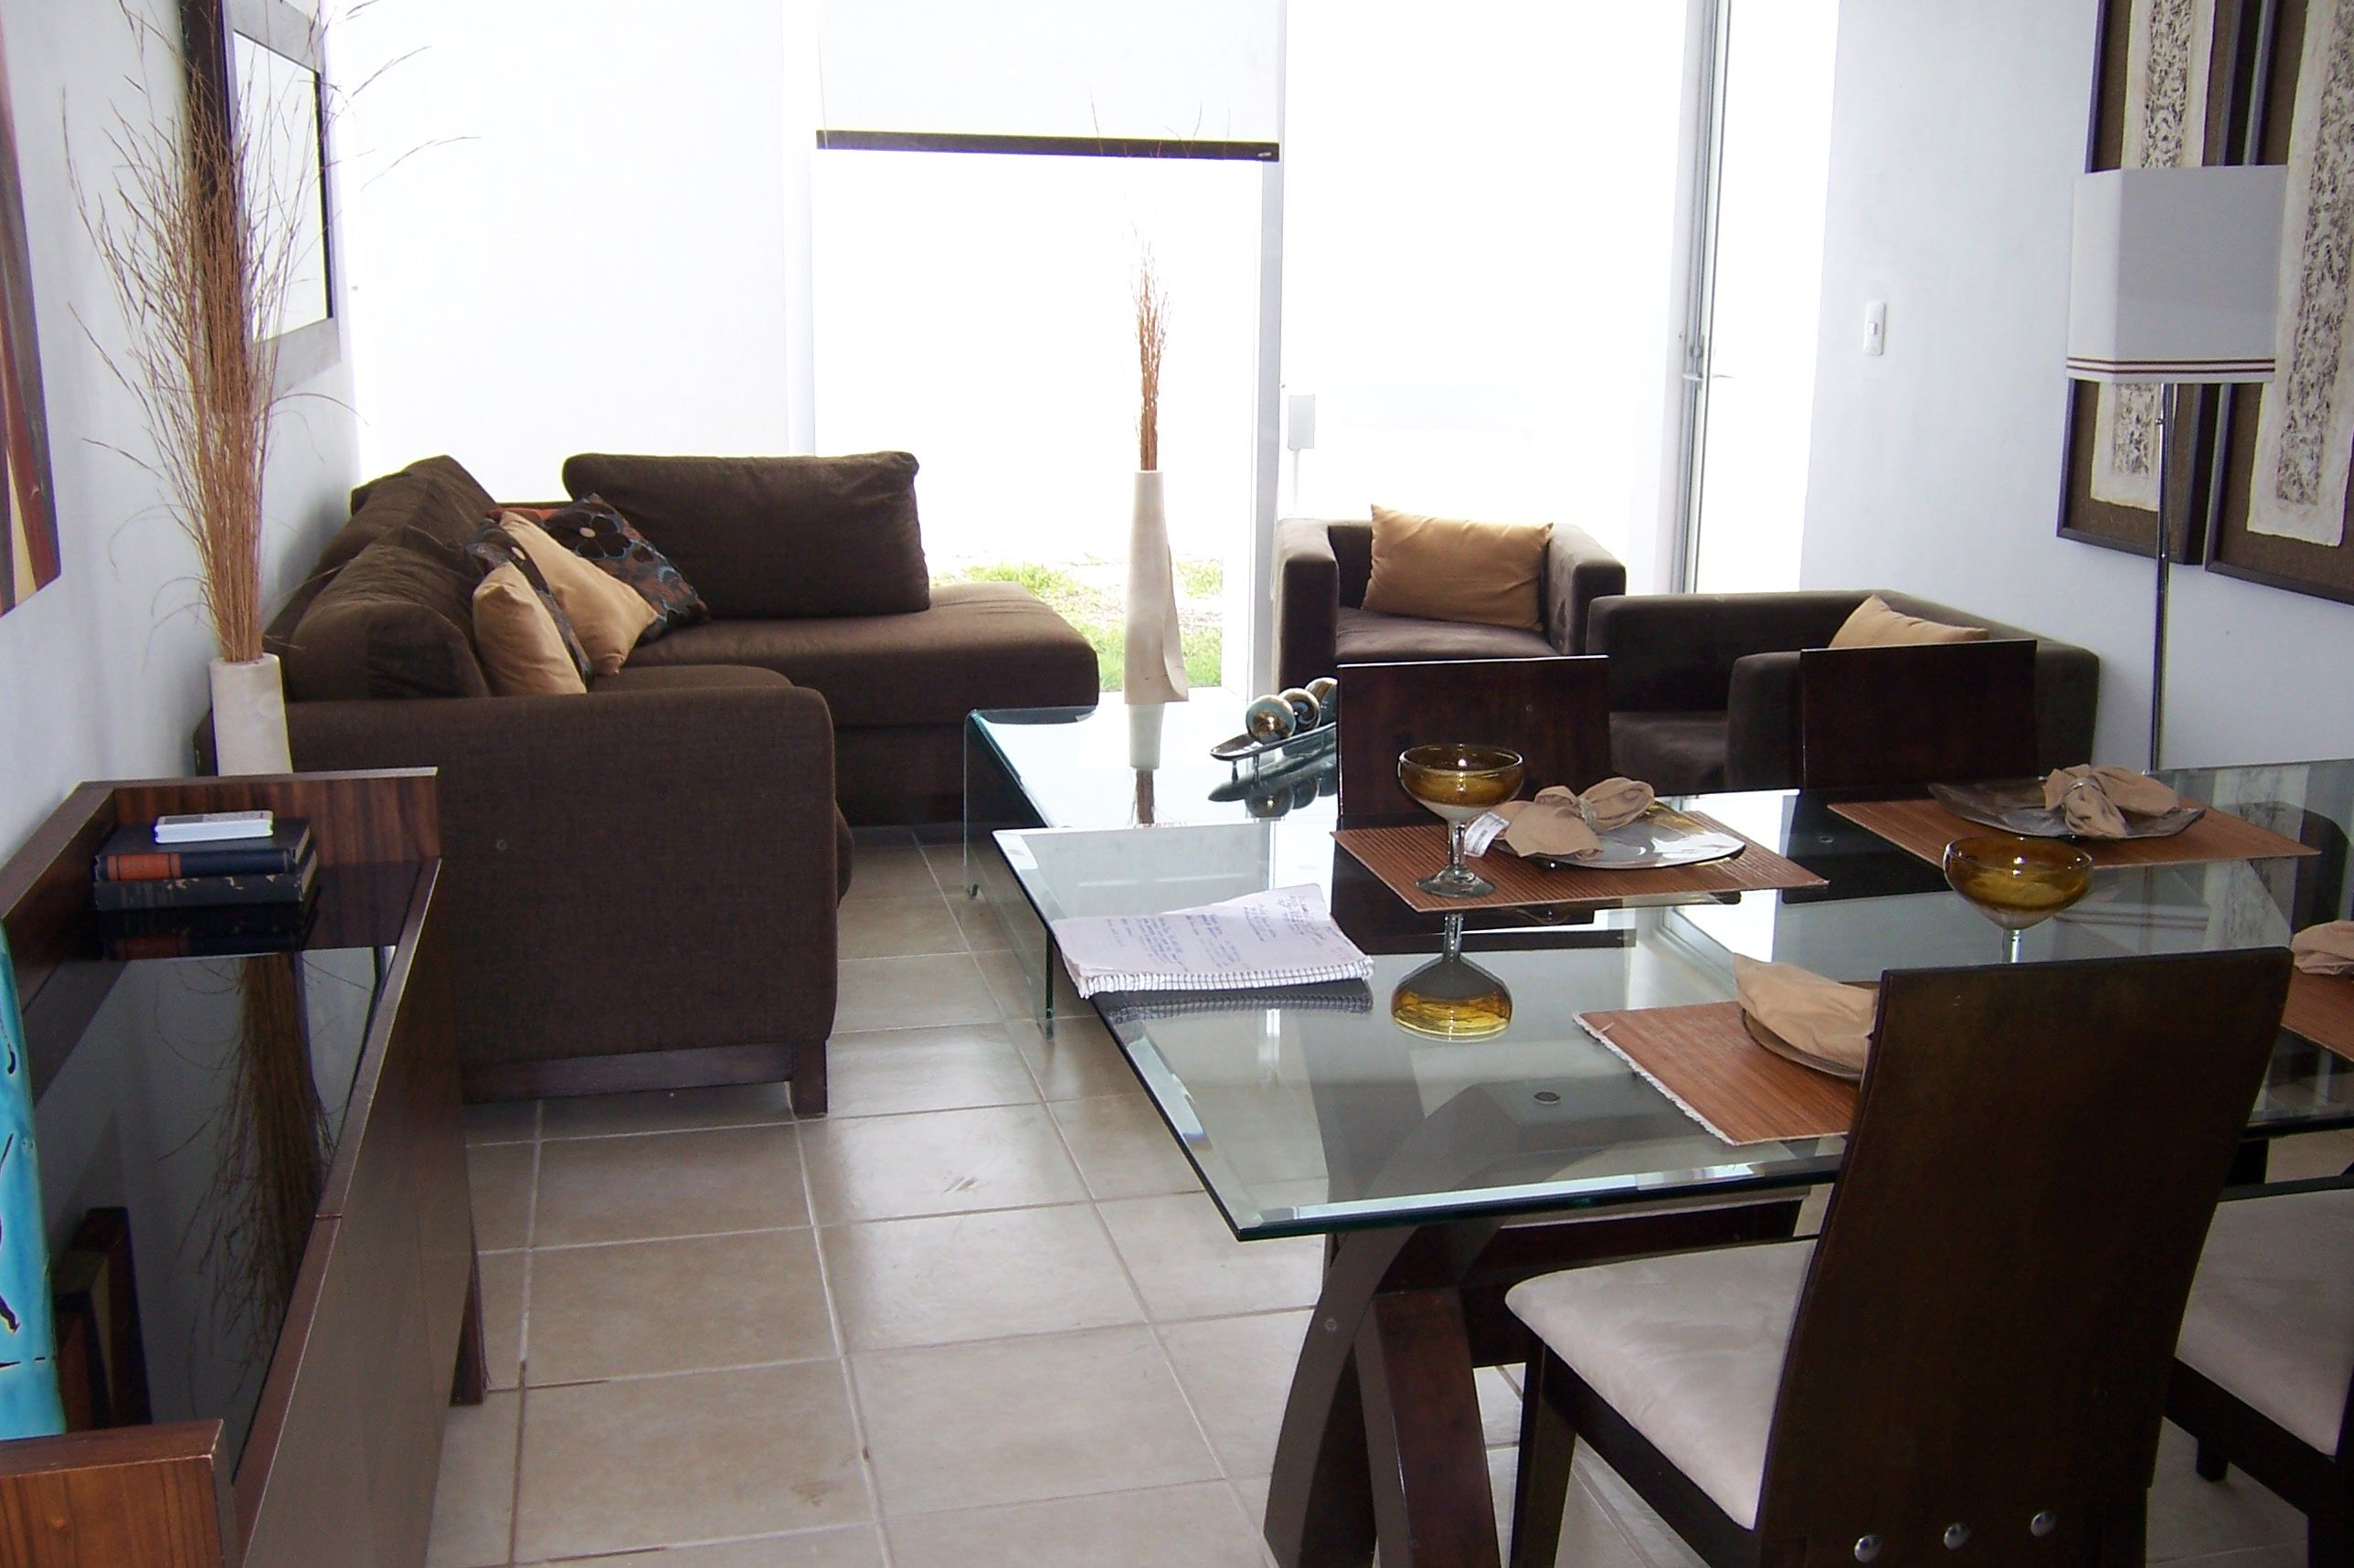 Salas modernas muebles para cocinas modernos departamentos for Decoracion de interiores para departamentos